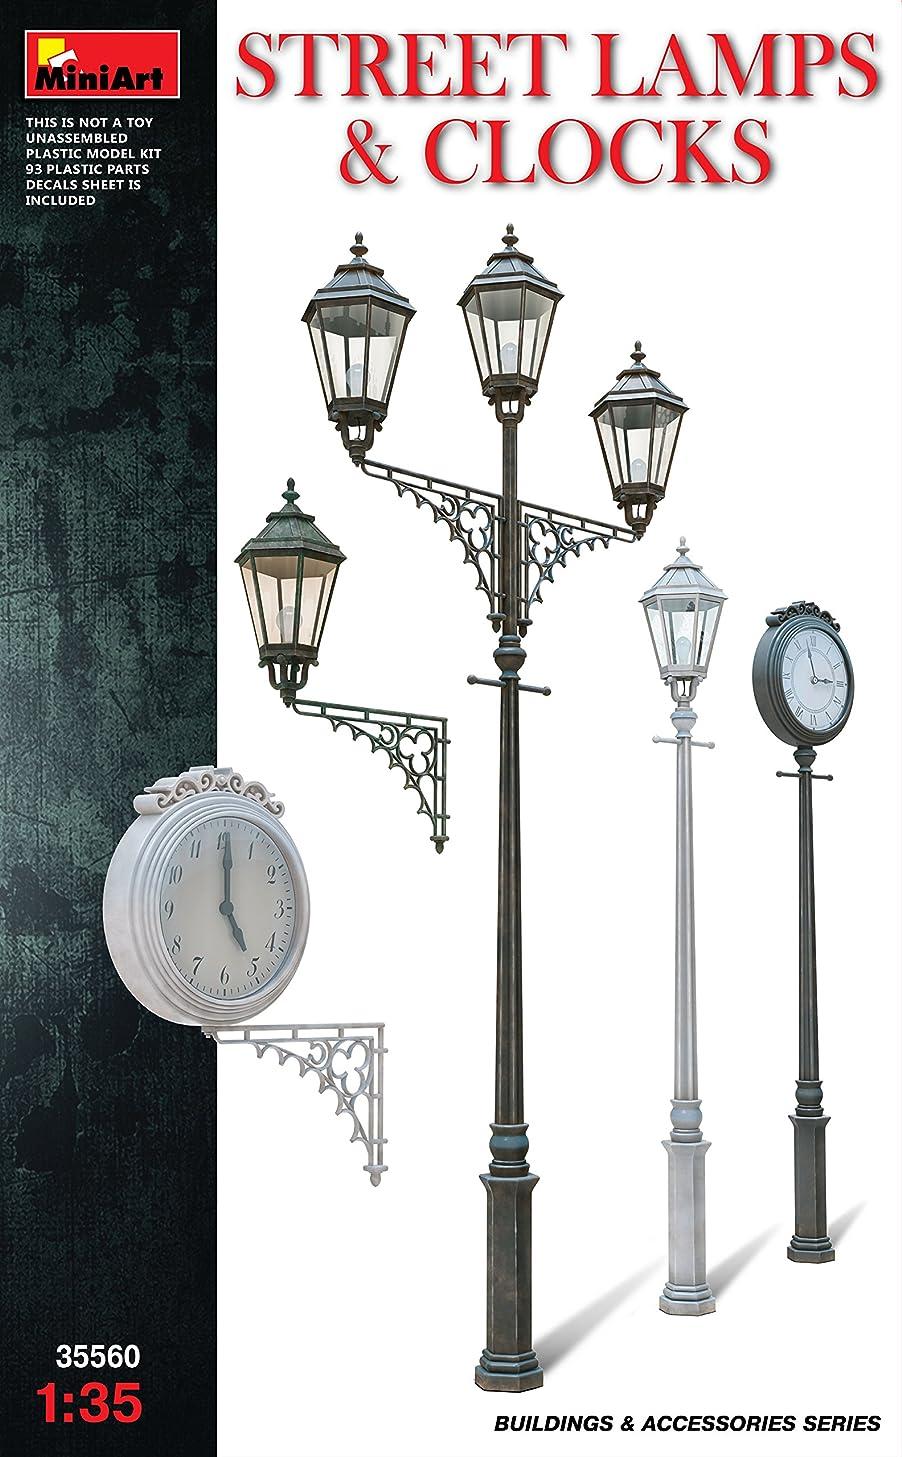 1:35 Miniart Street Lamps & Clocks Set Model Kit